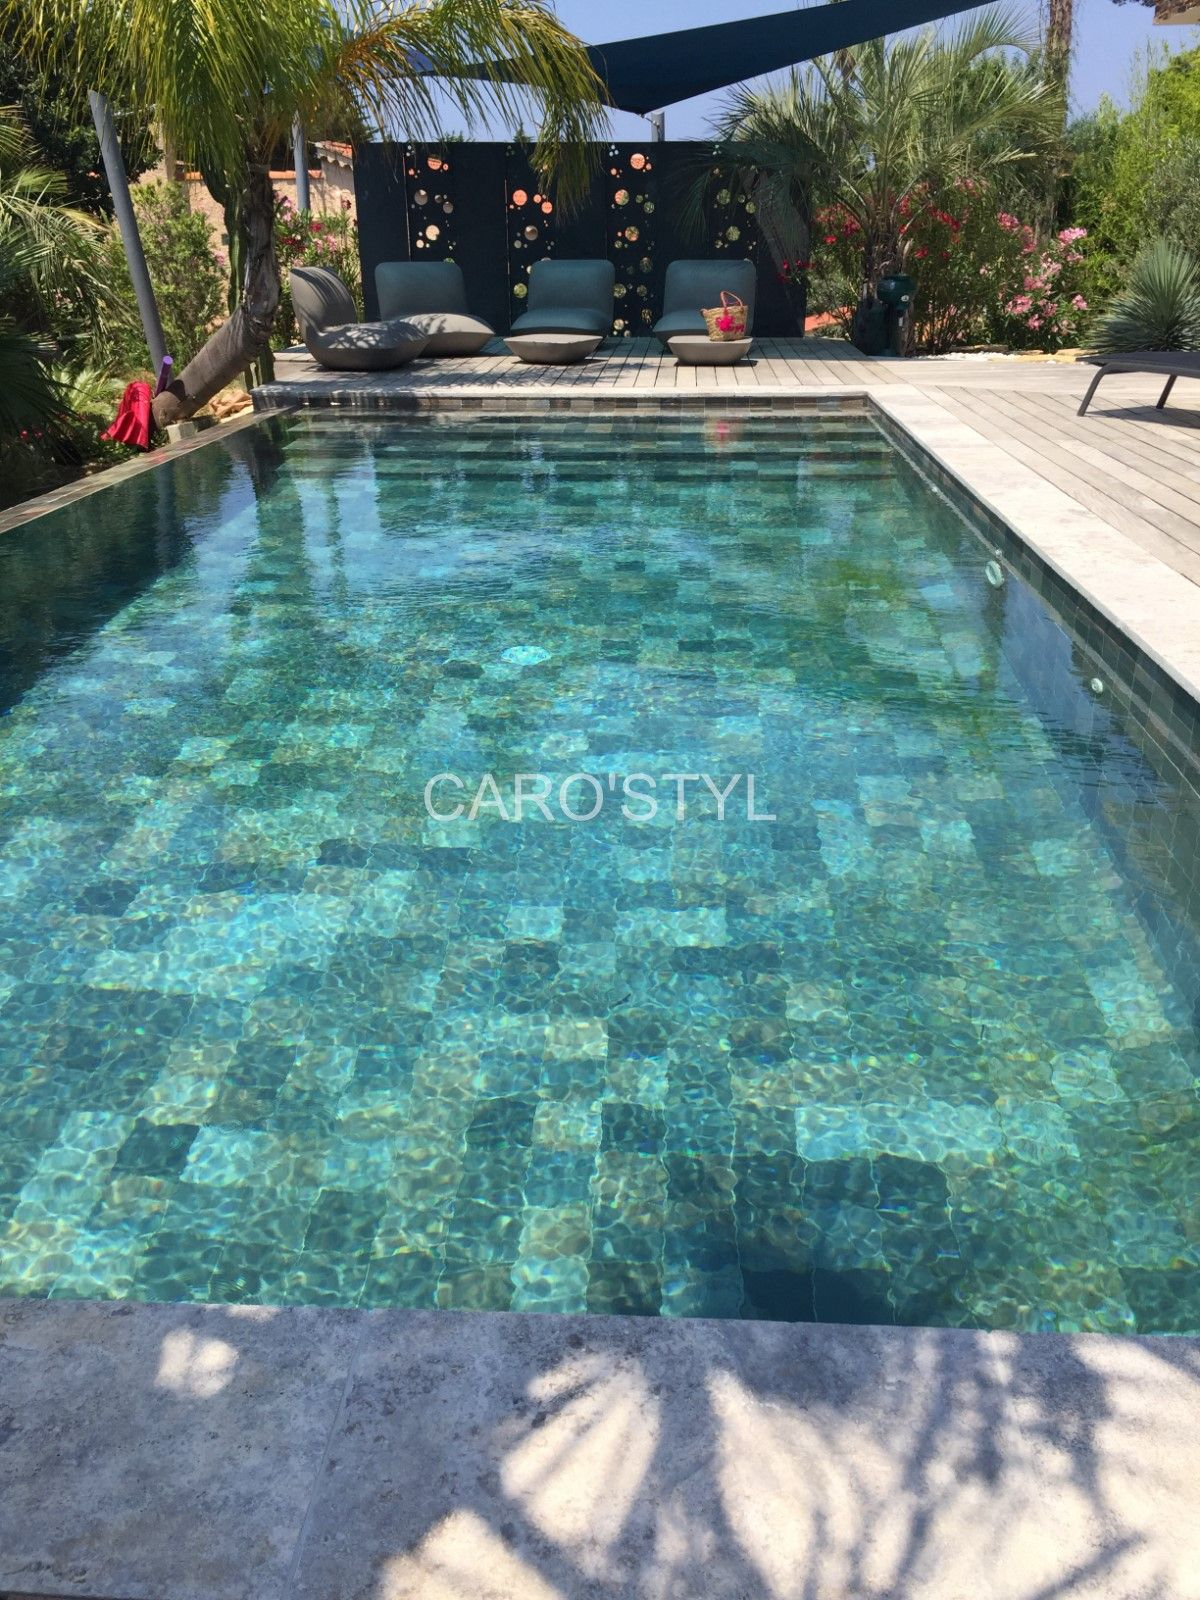 Carrelage pour piscine verte ce carrelage effet pierre